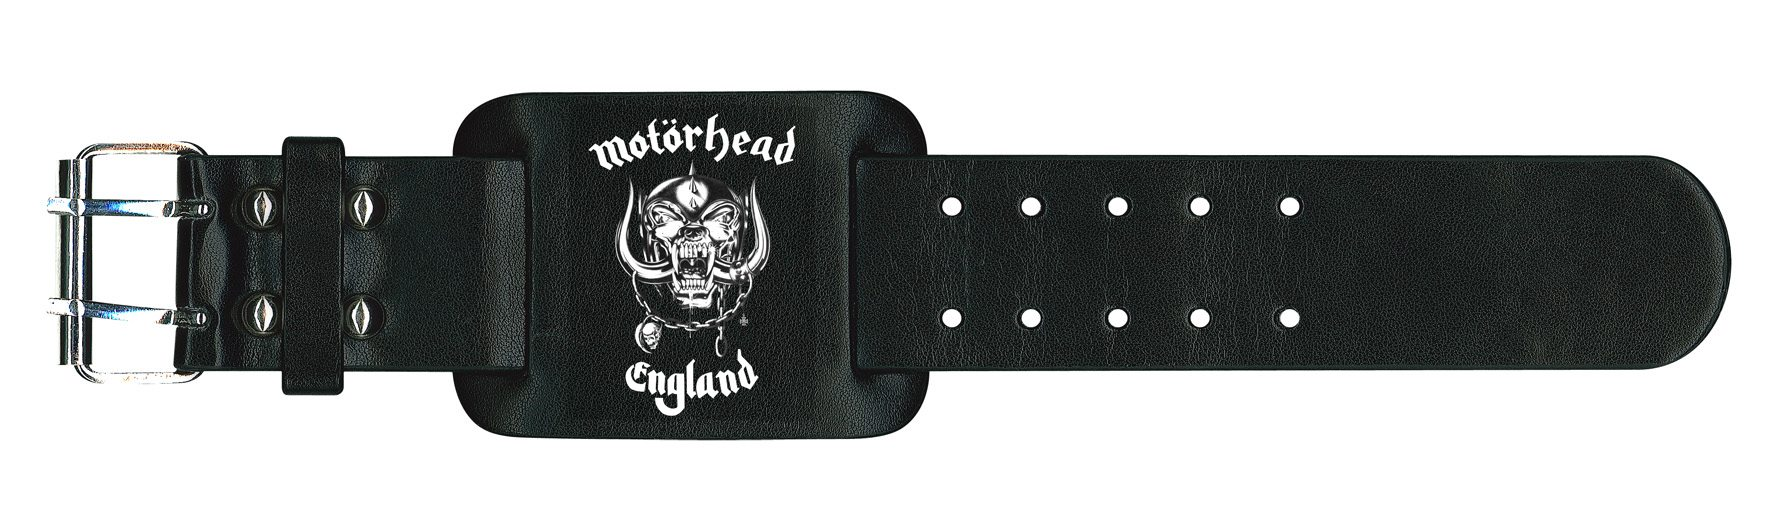 Motorhead Leather Wristband England